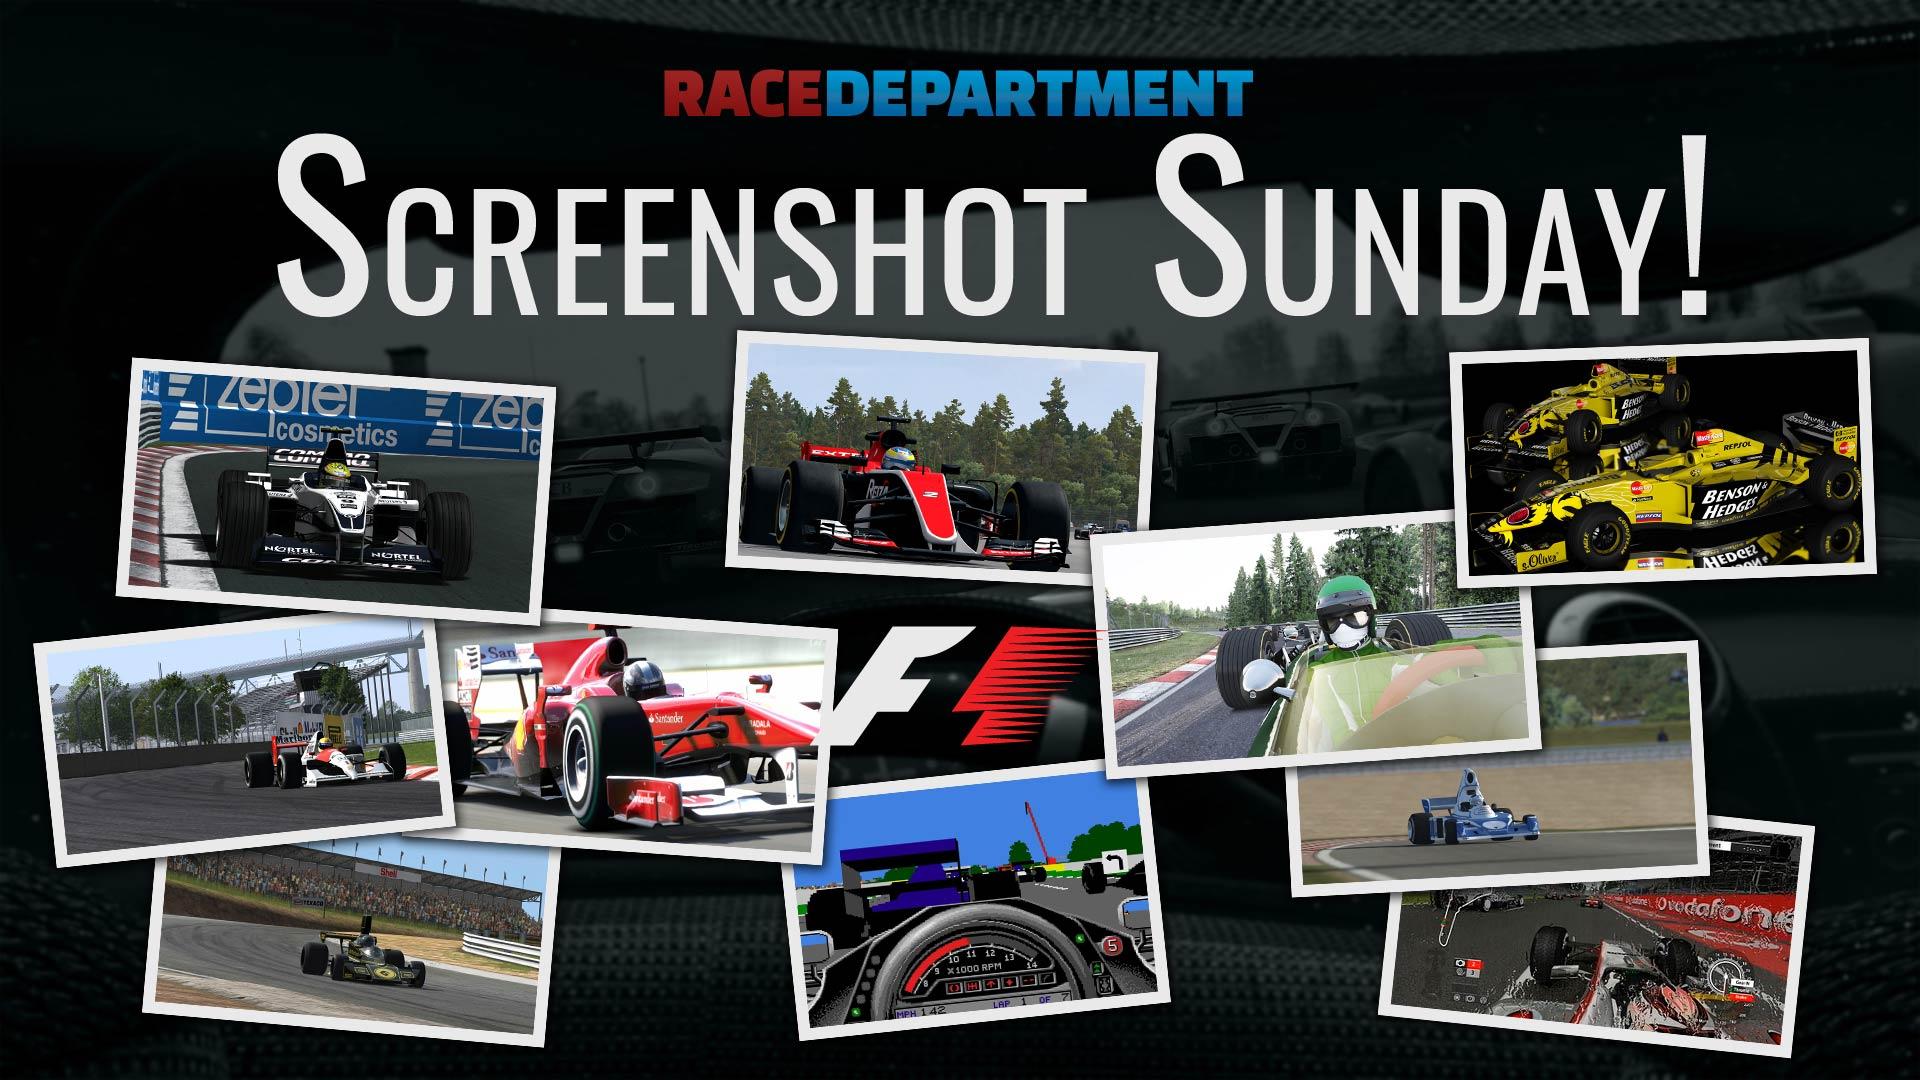 Screenshot Sunday - Formula One.jpg